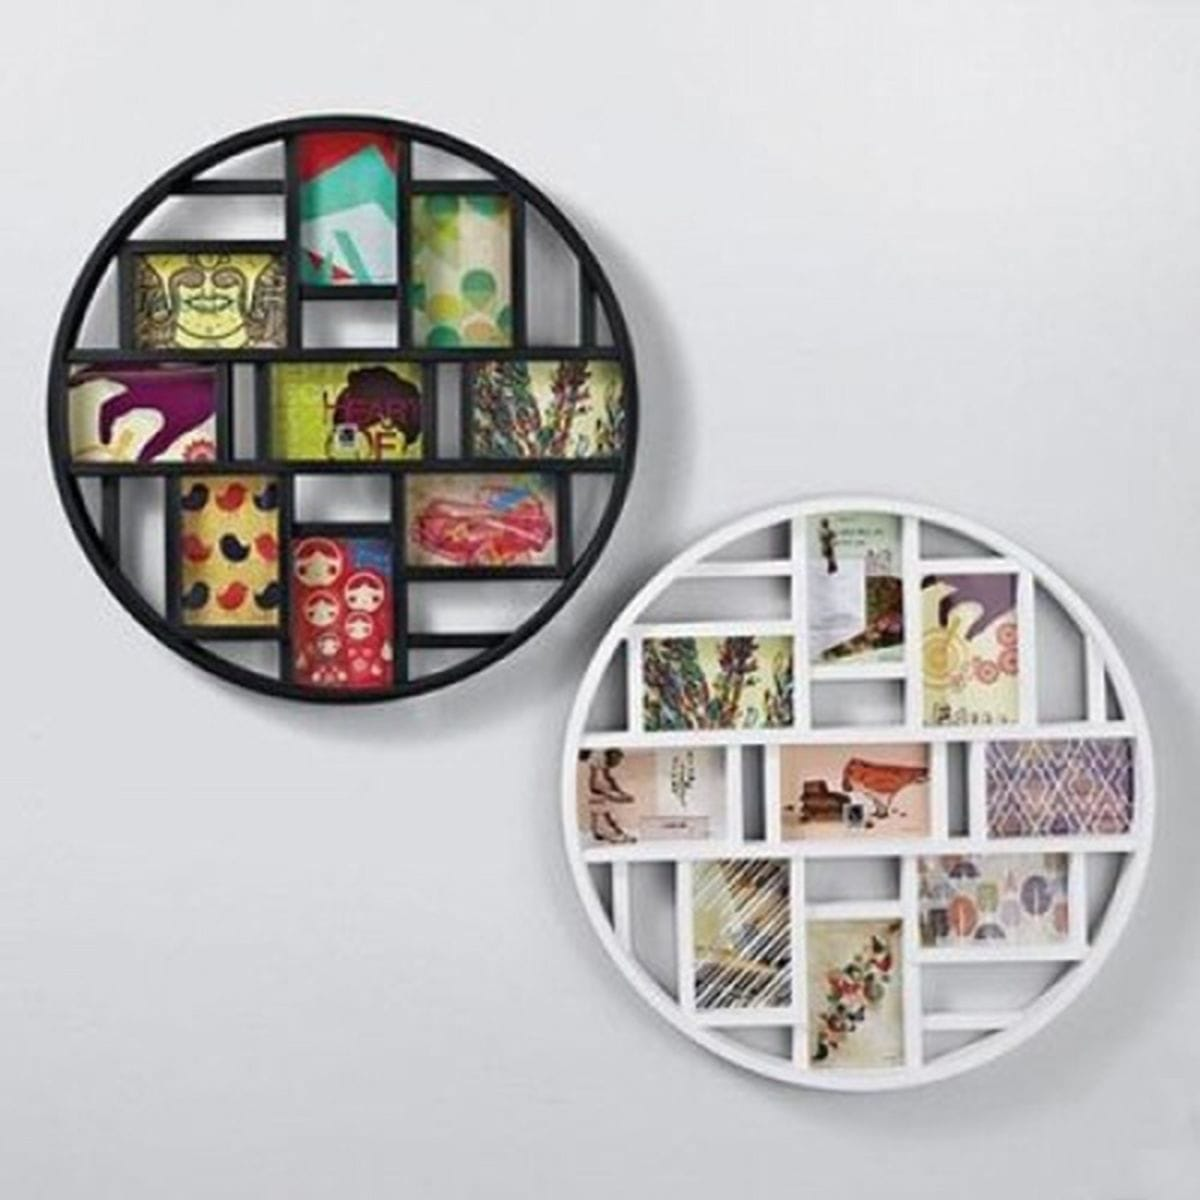 creative photo gift ideas